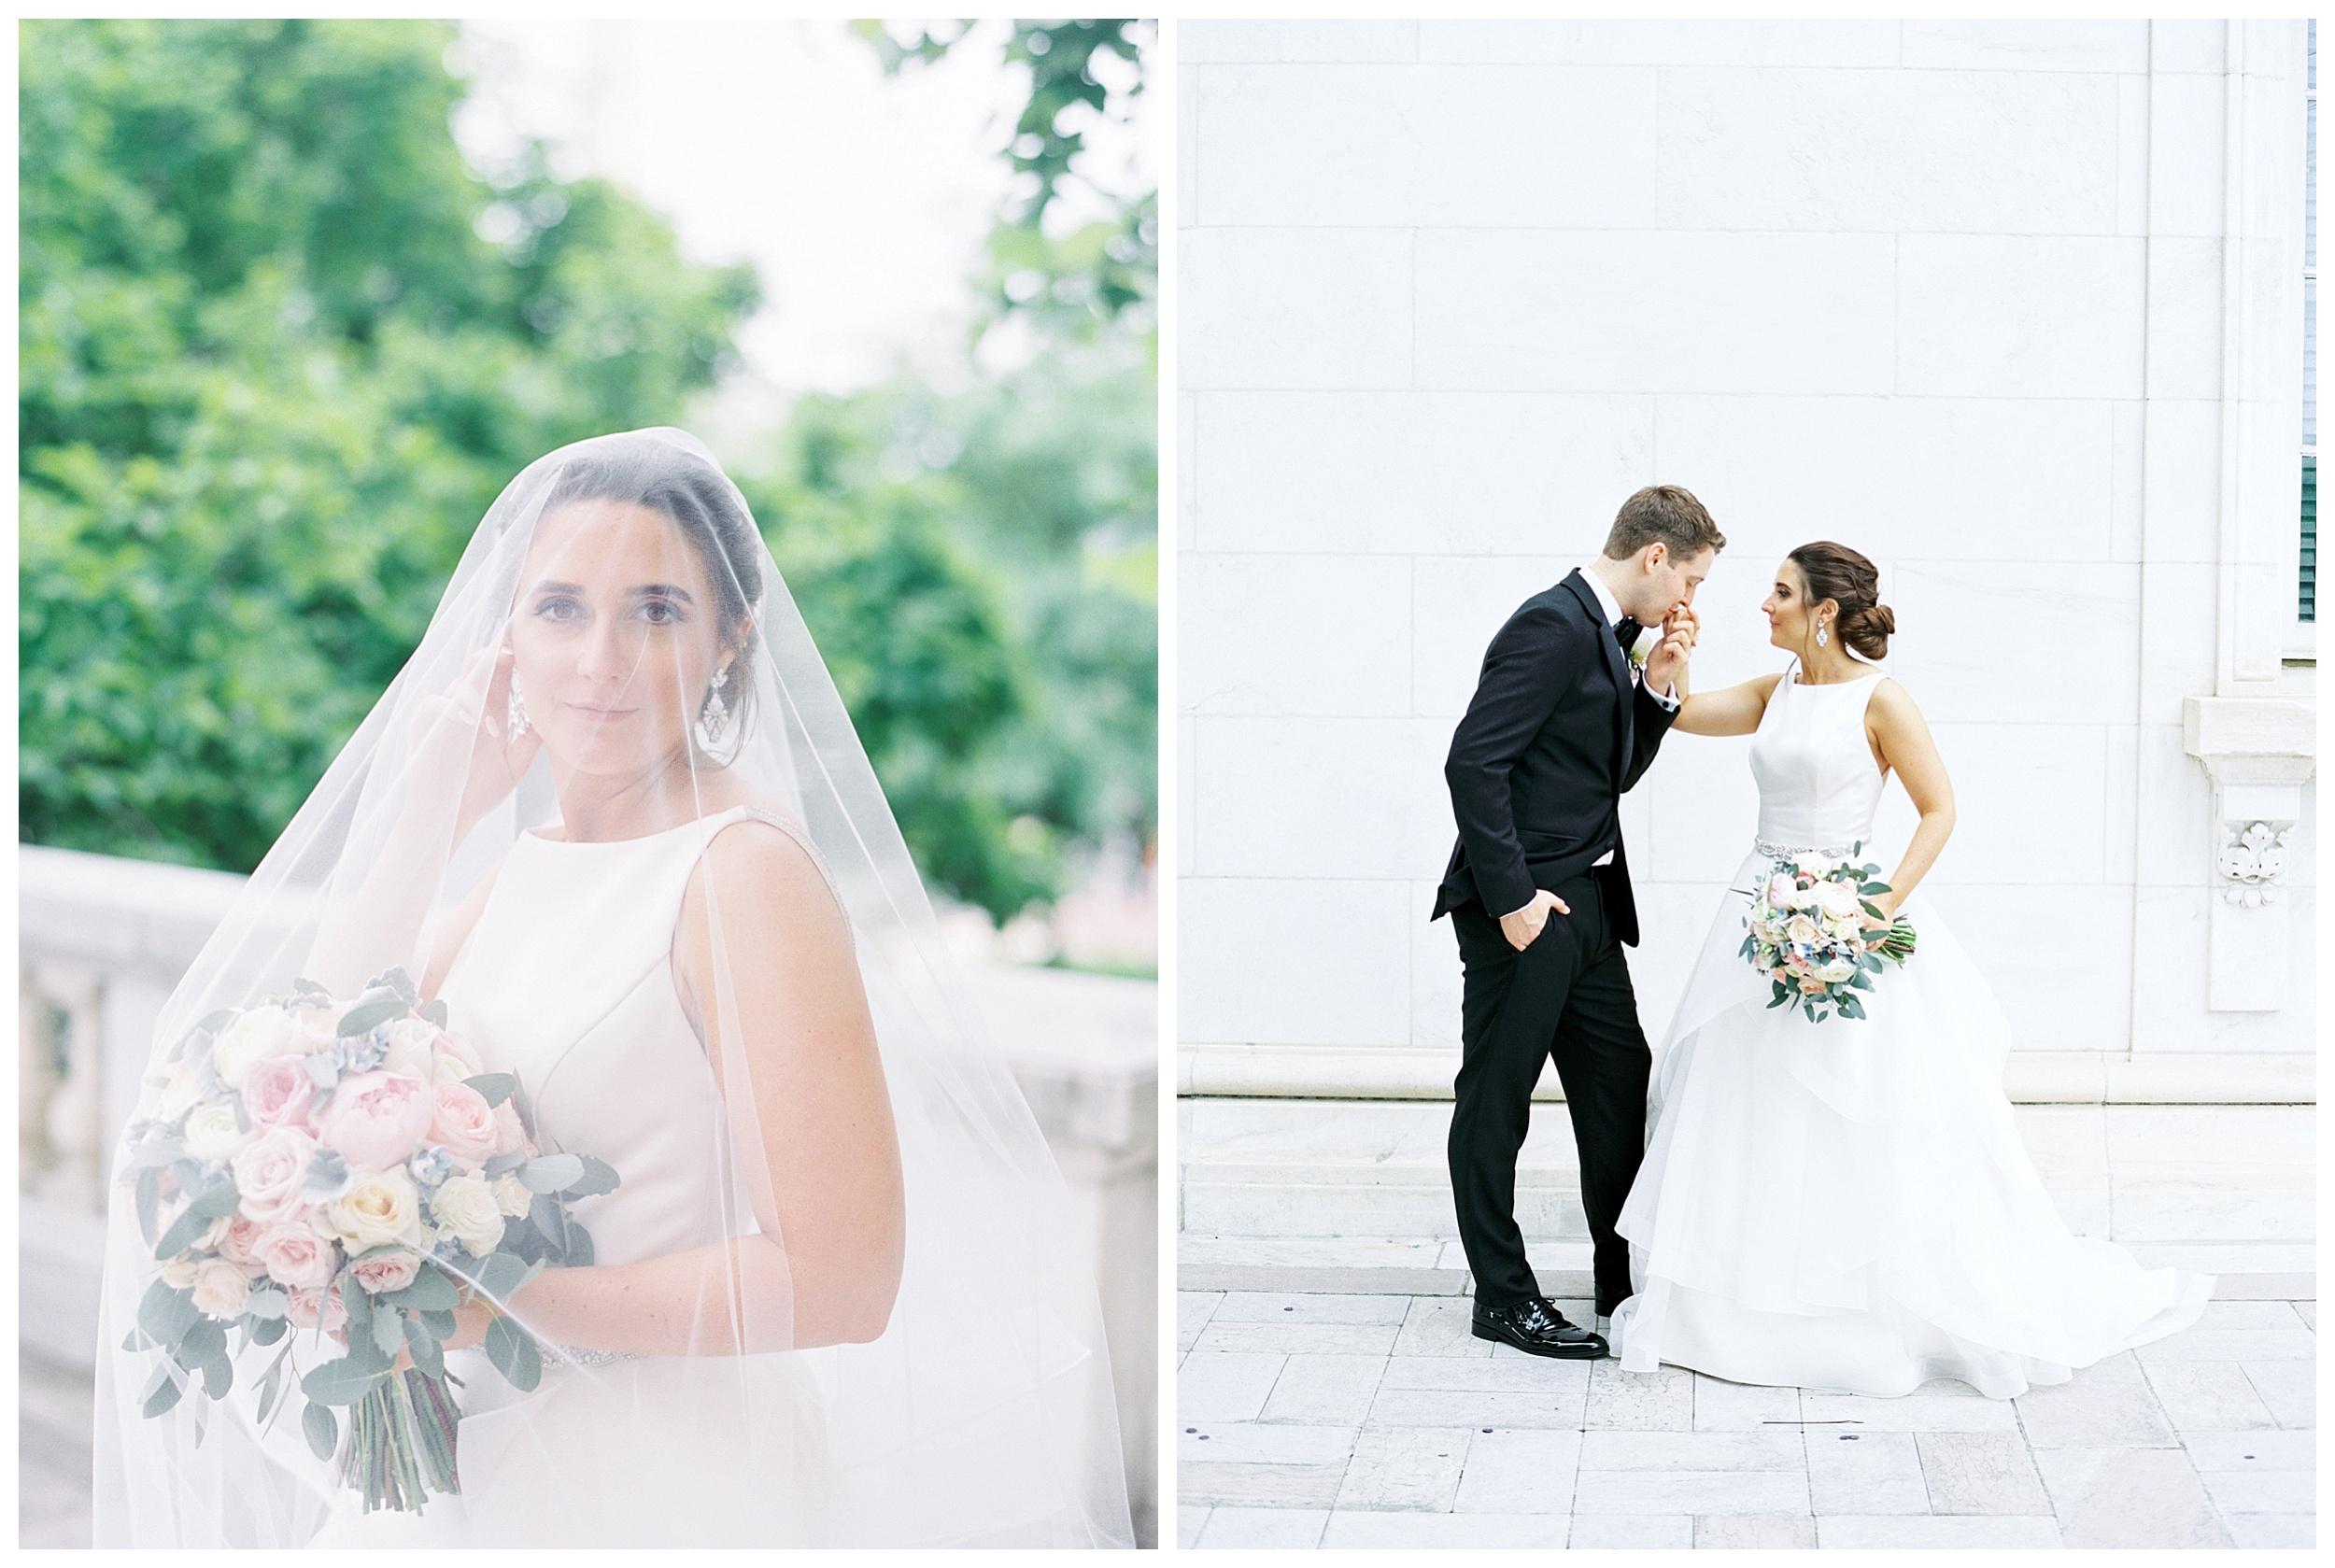 DAR Constitution Hall Wedding Wedding | Daughters of the American Revolution Wedding | District of Columbia Film Wedding Photographer Kir Tuben_0104.jpg